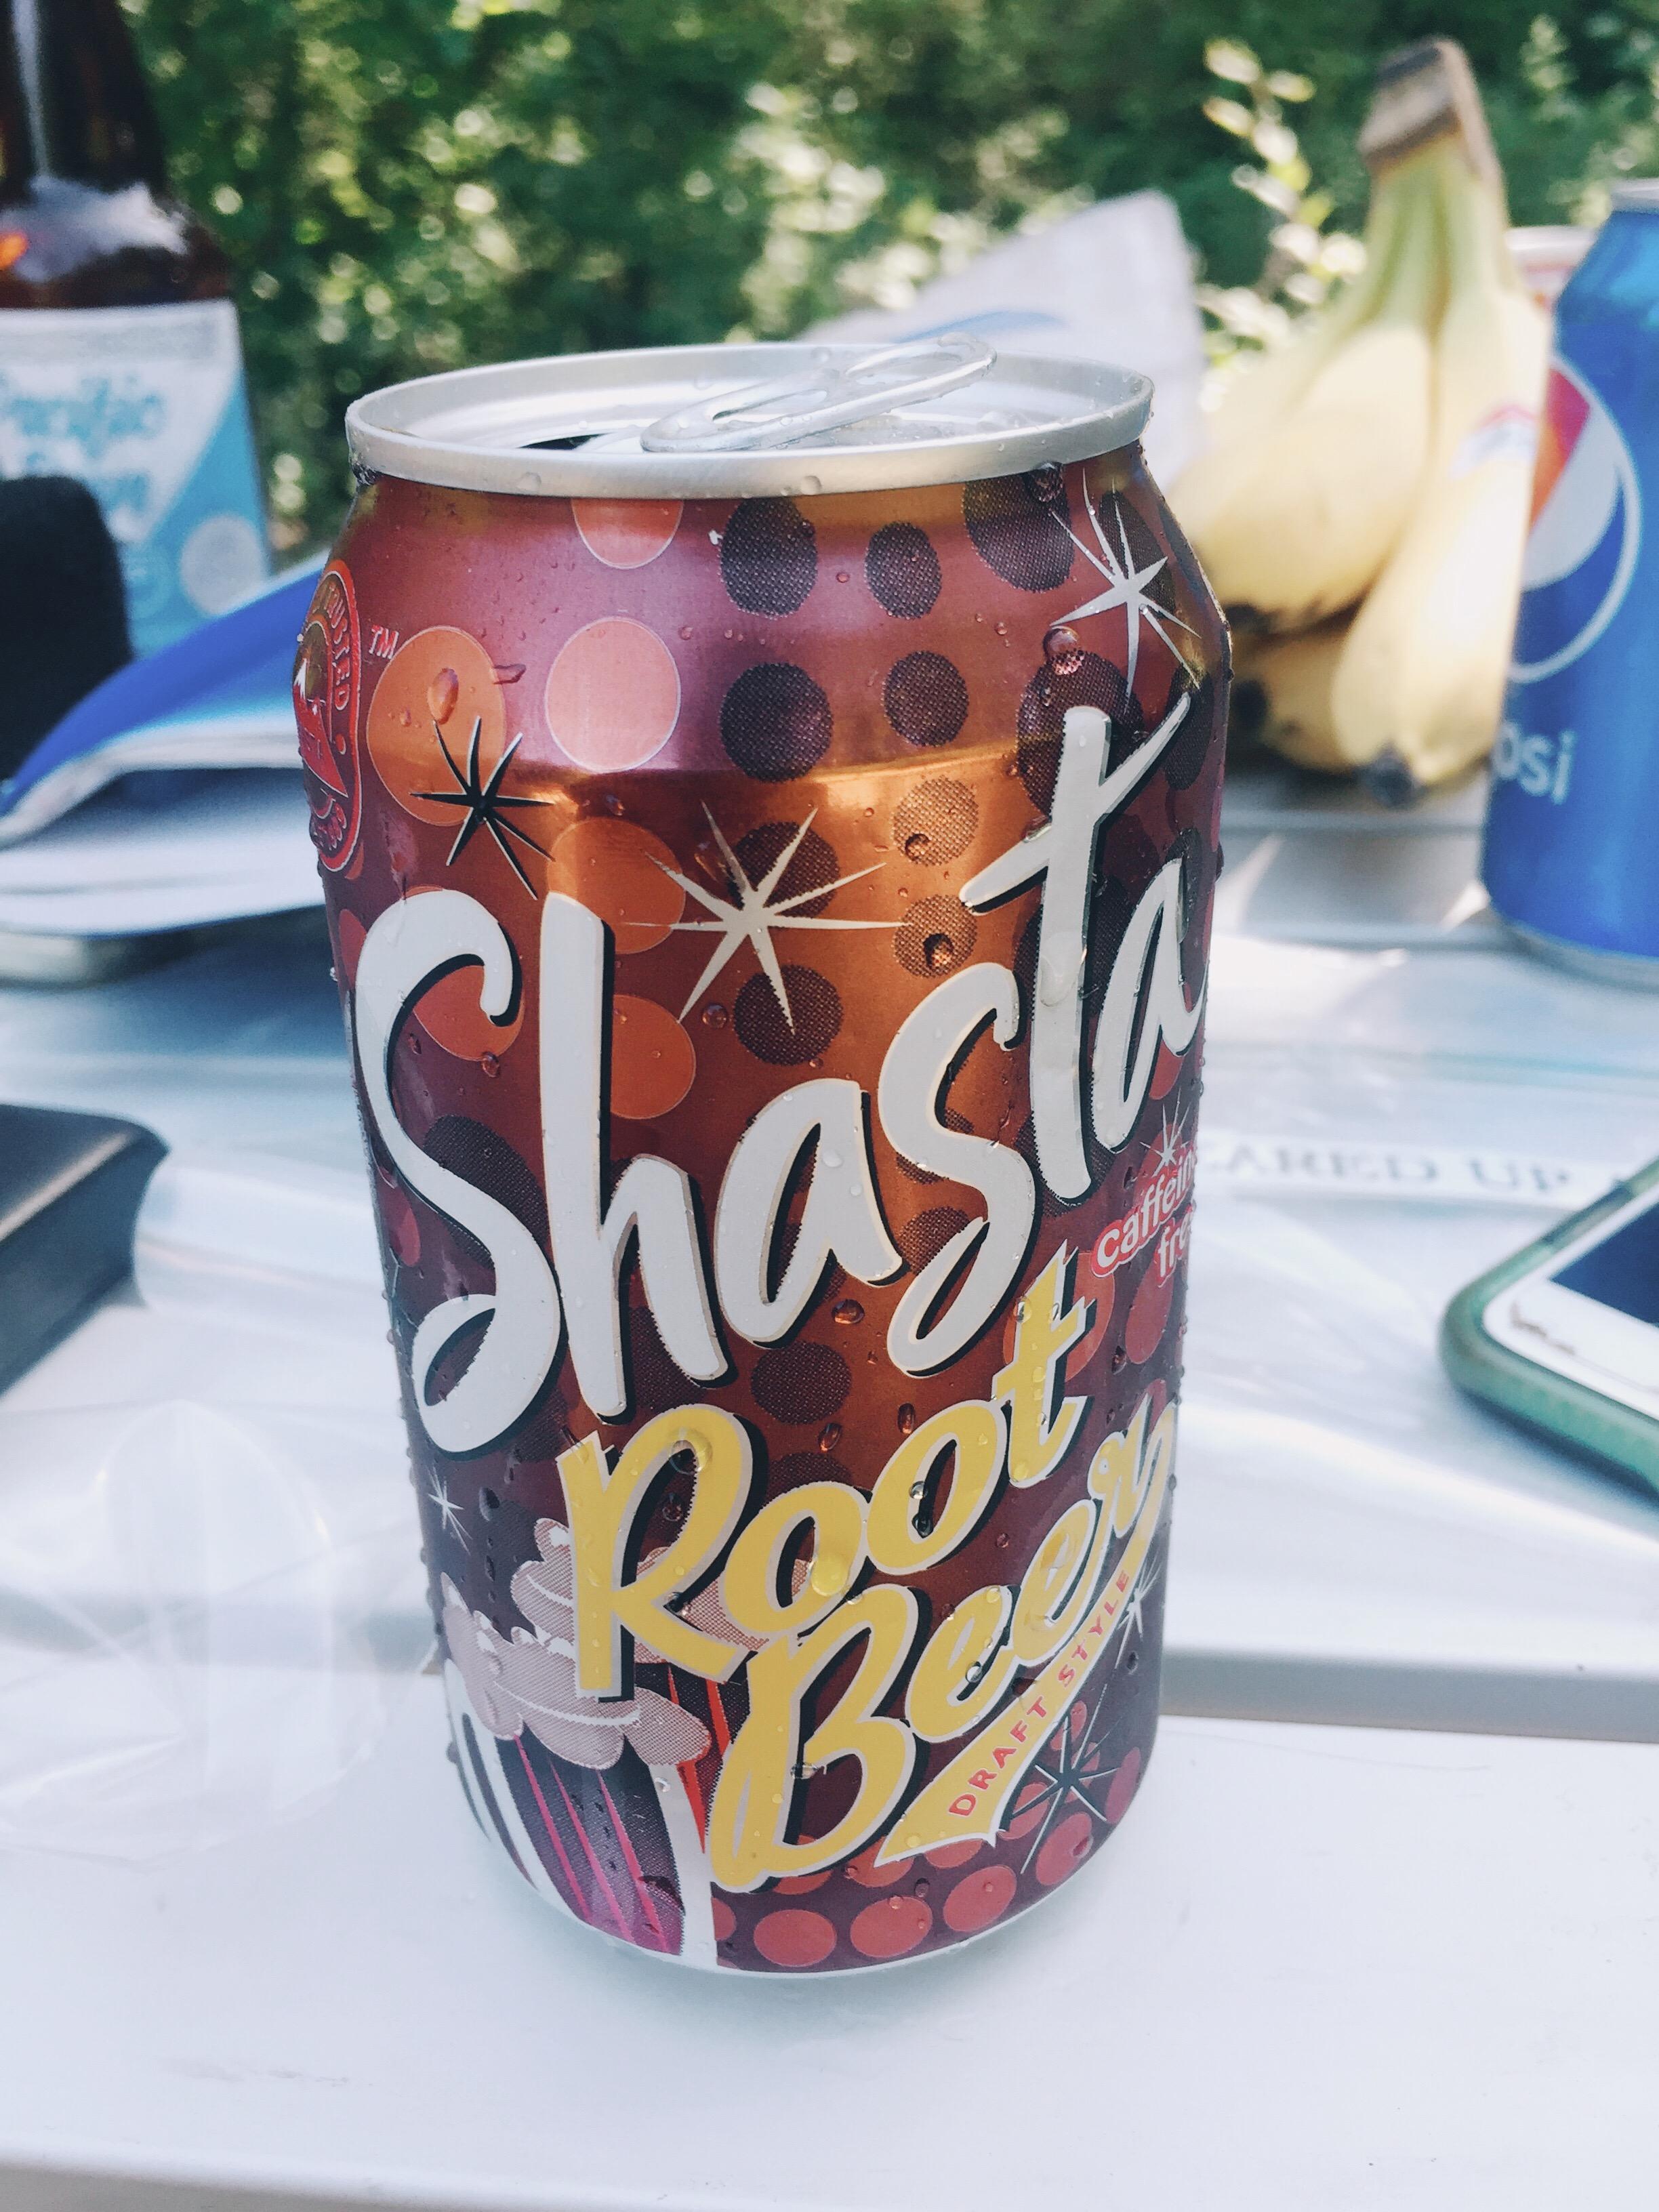 my first soda